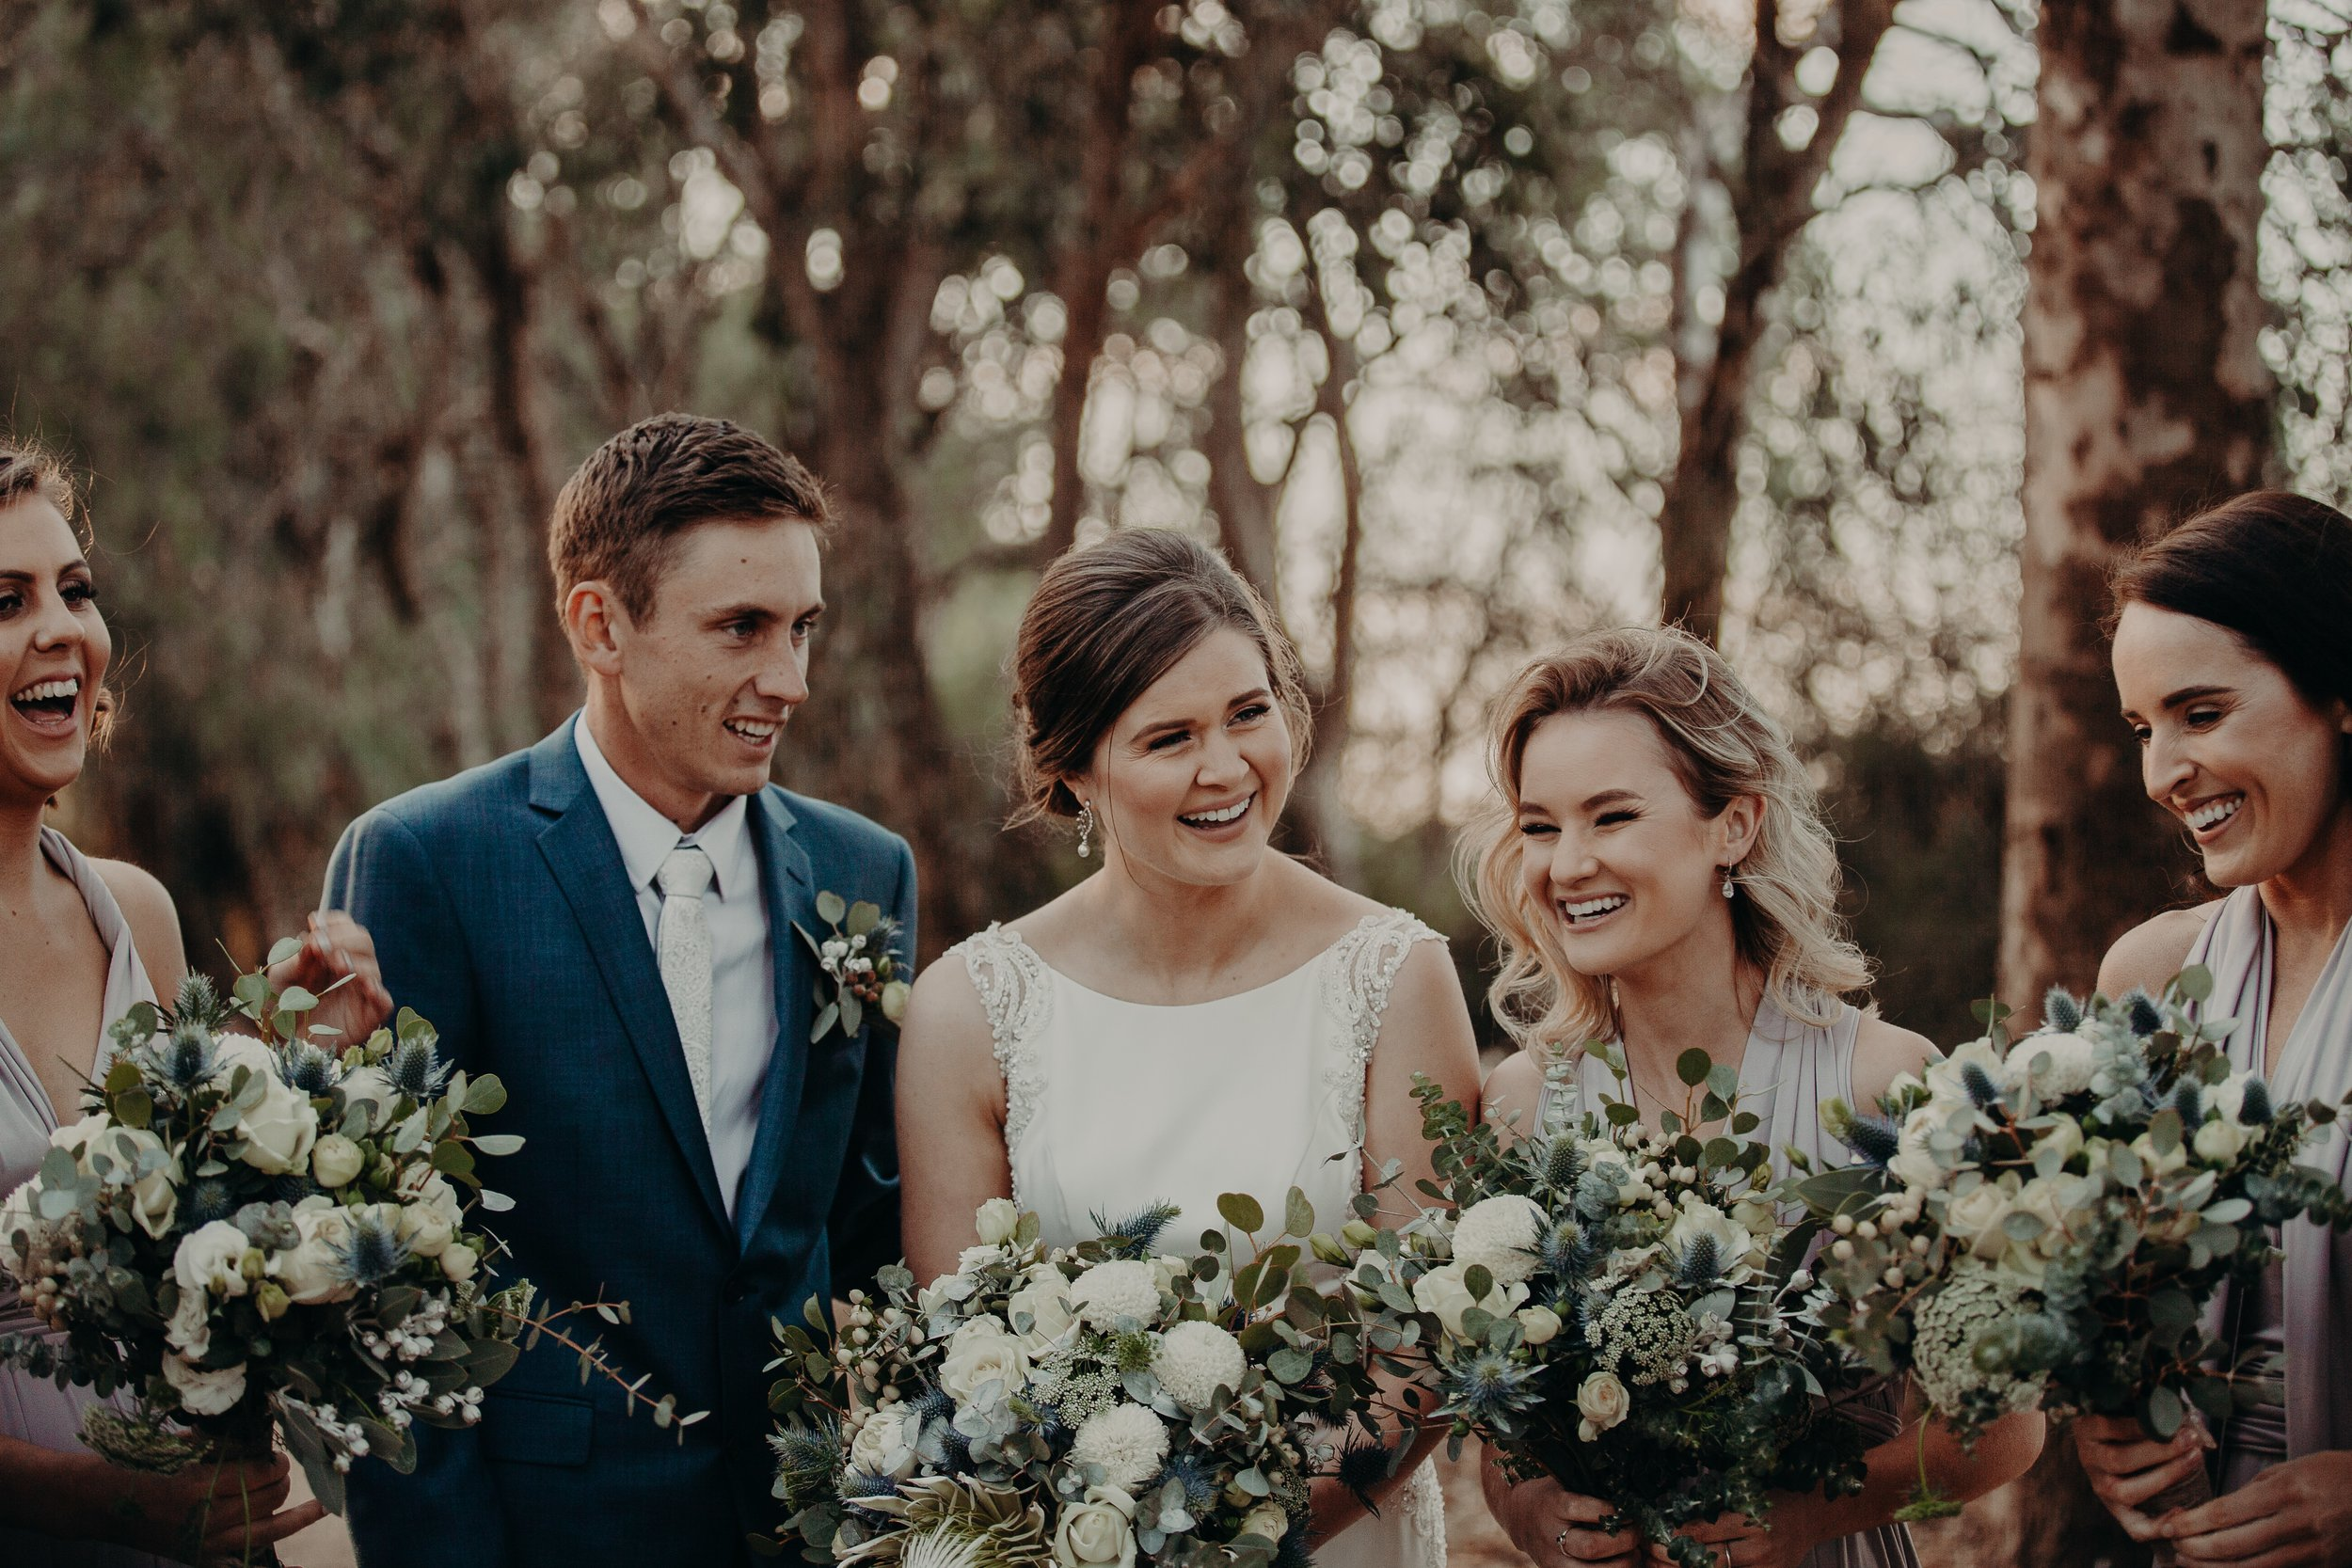 mickalathomas_puremacphotography_weddingphotographer_couplephotographer_Sheppartonphotographer_2553.jpg